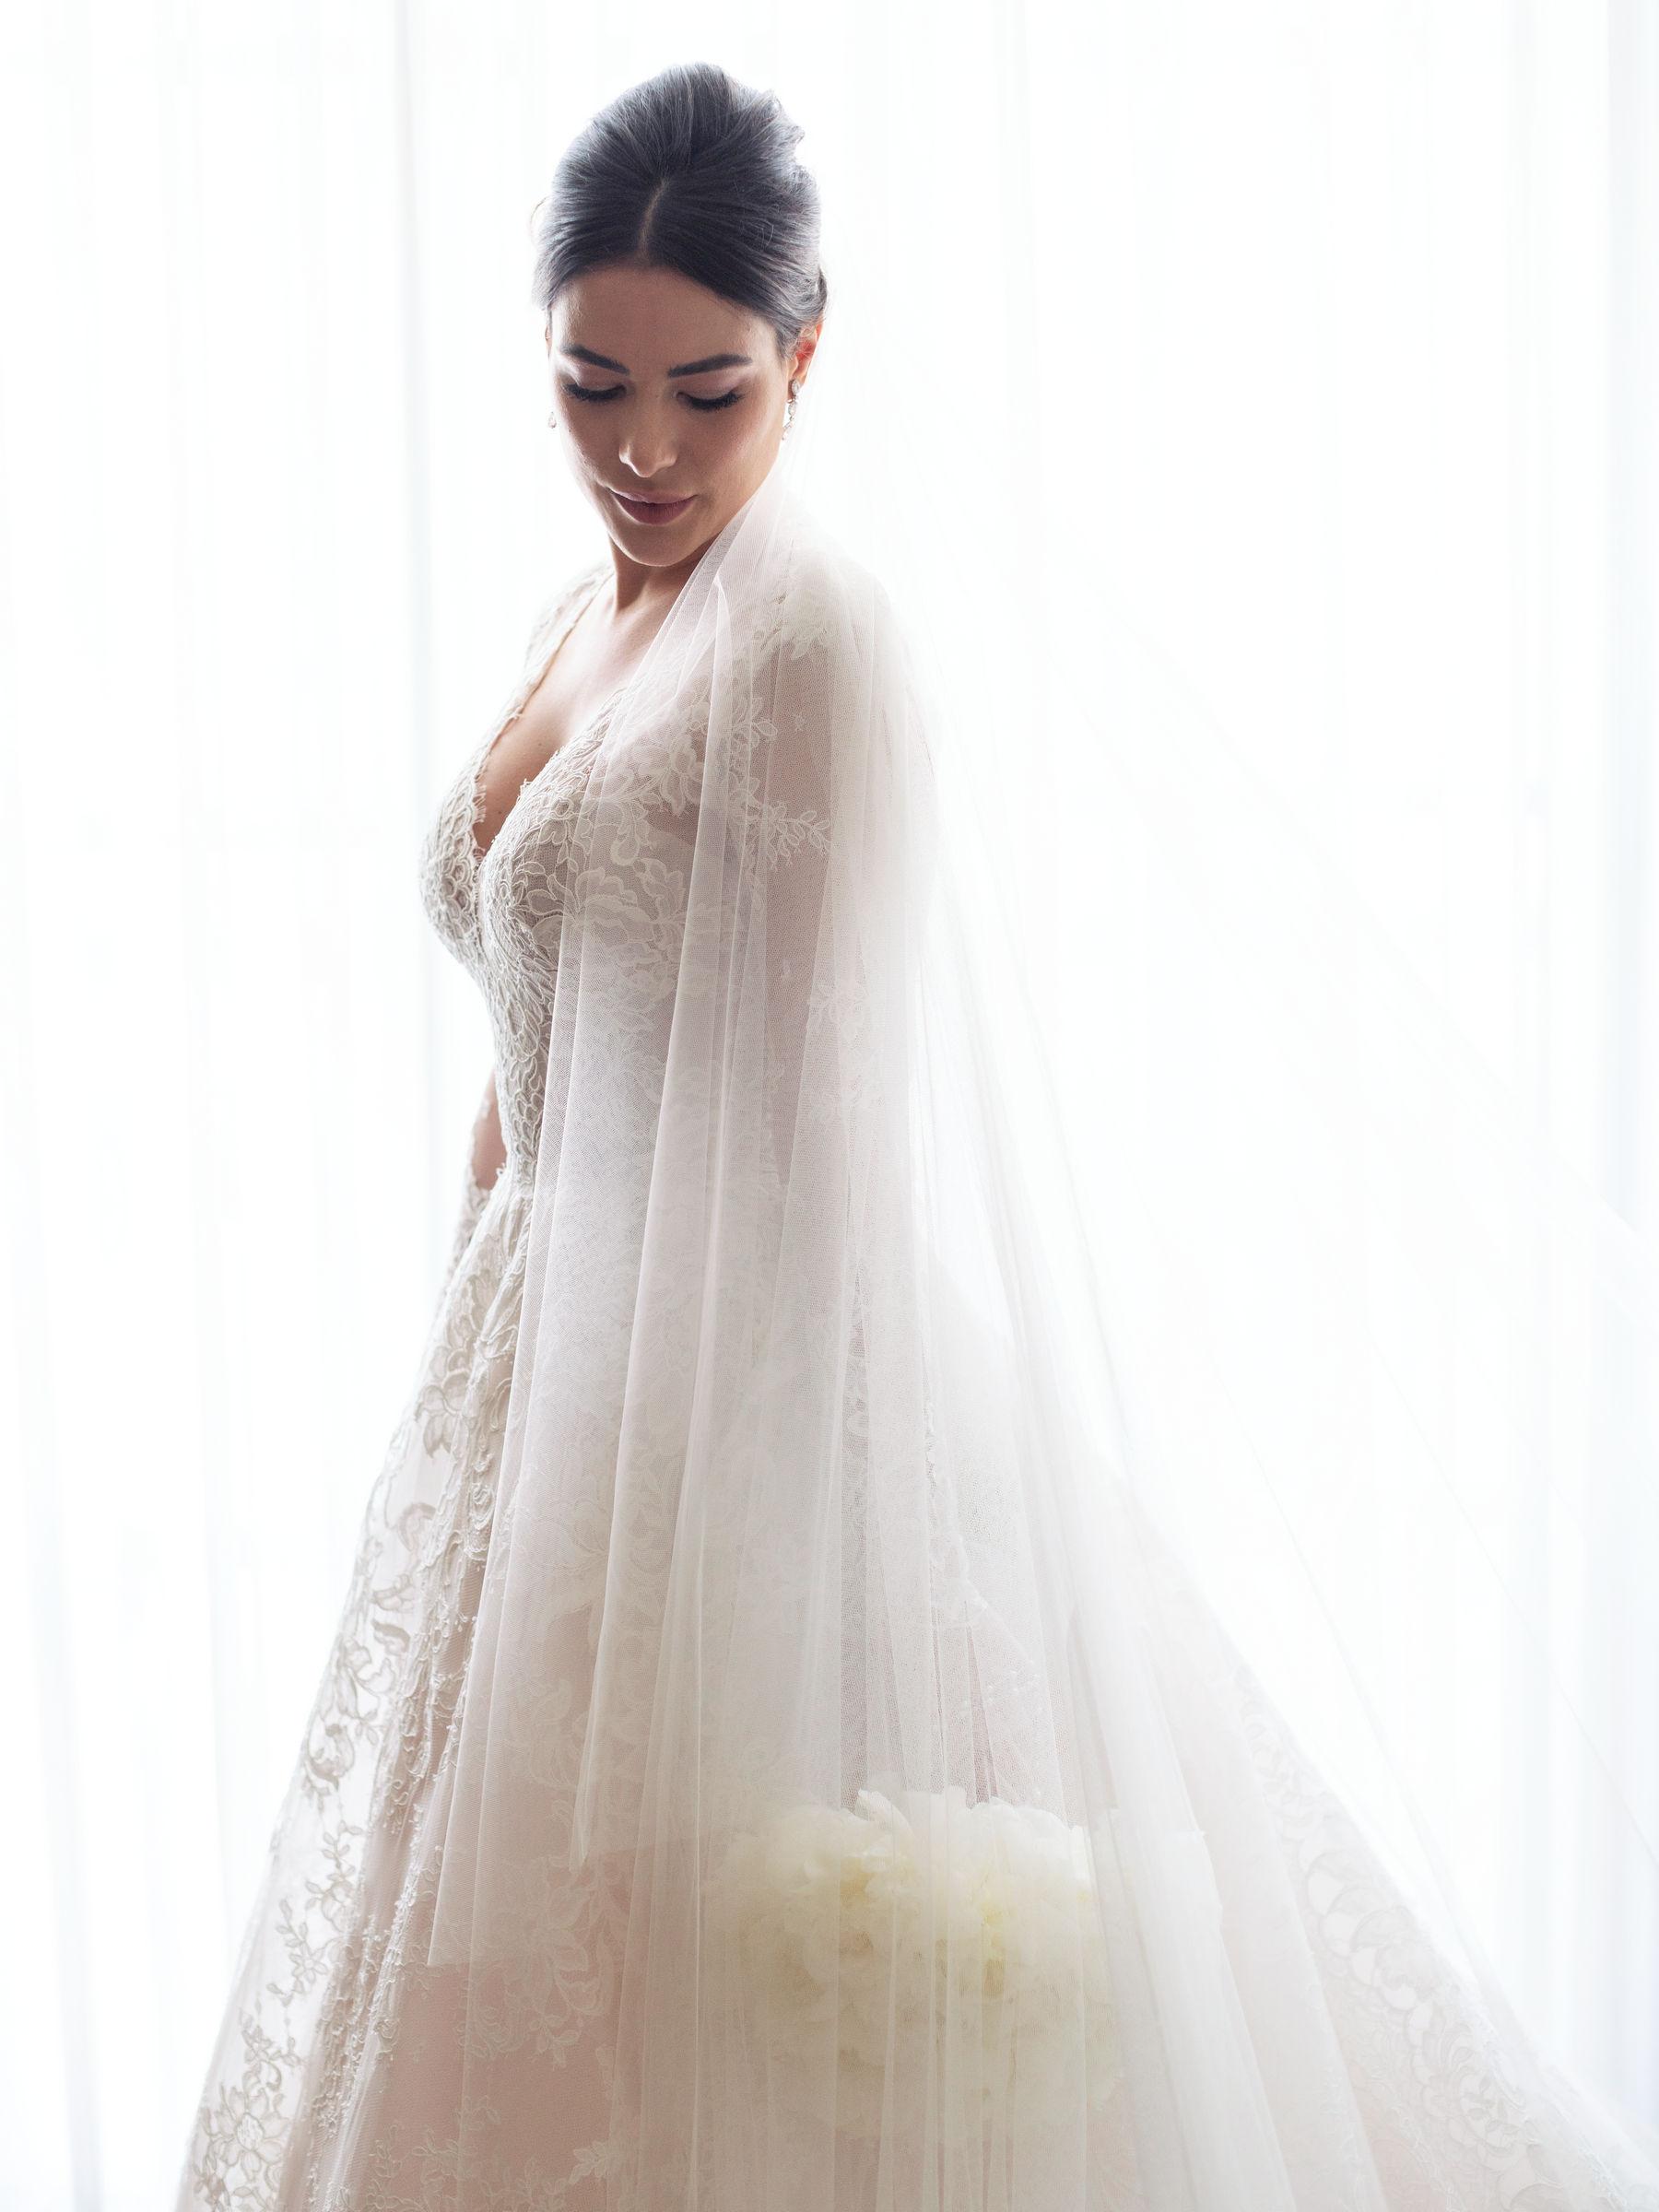 maria-eduardo-montage-beverly-hills-wedding-132.jpg